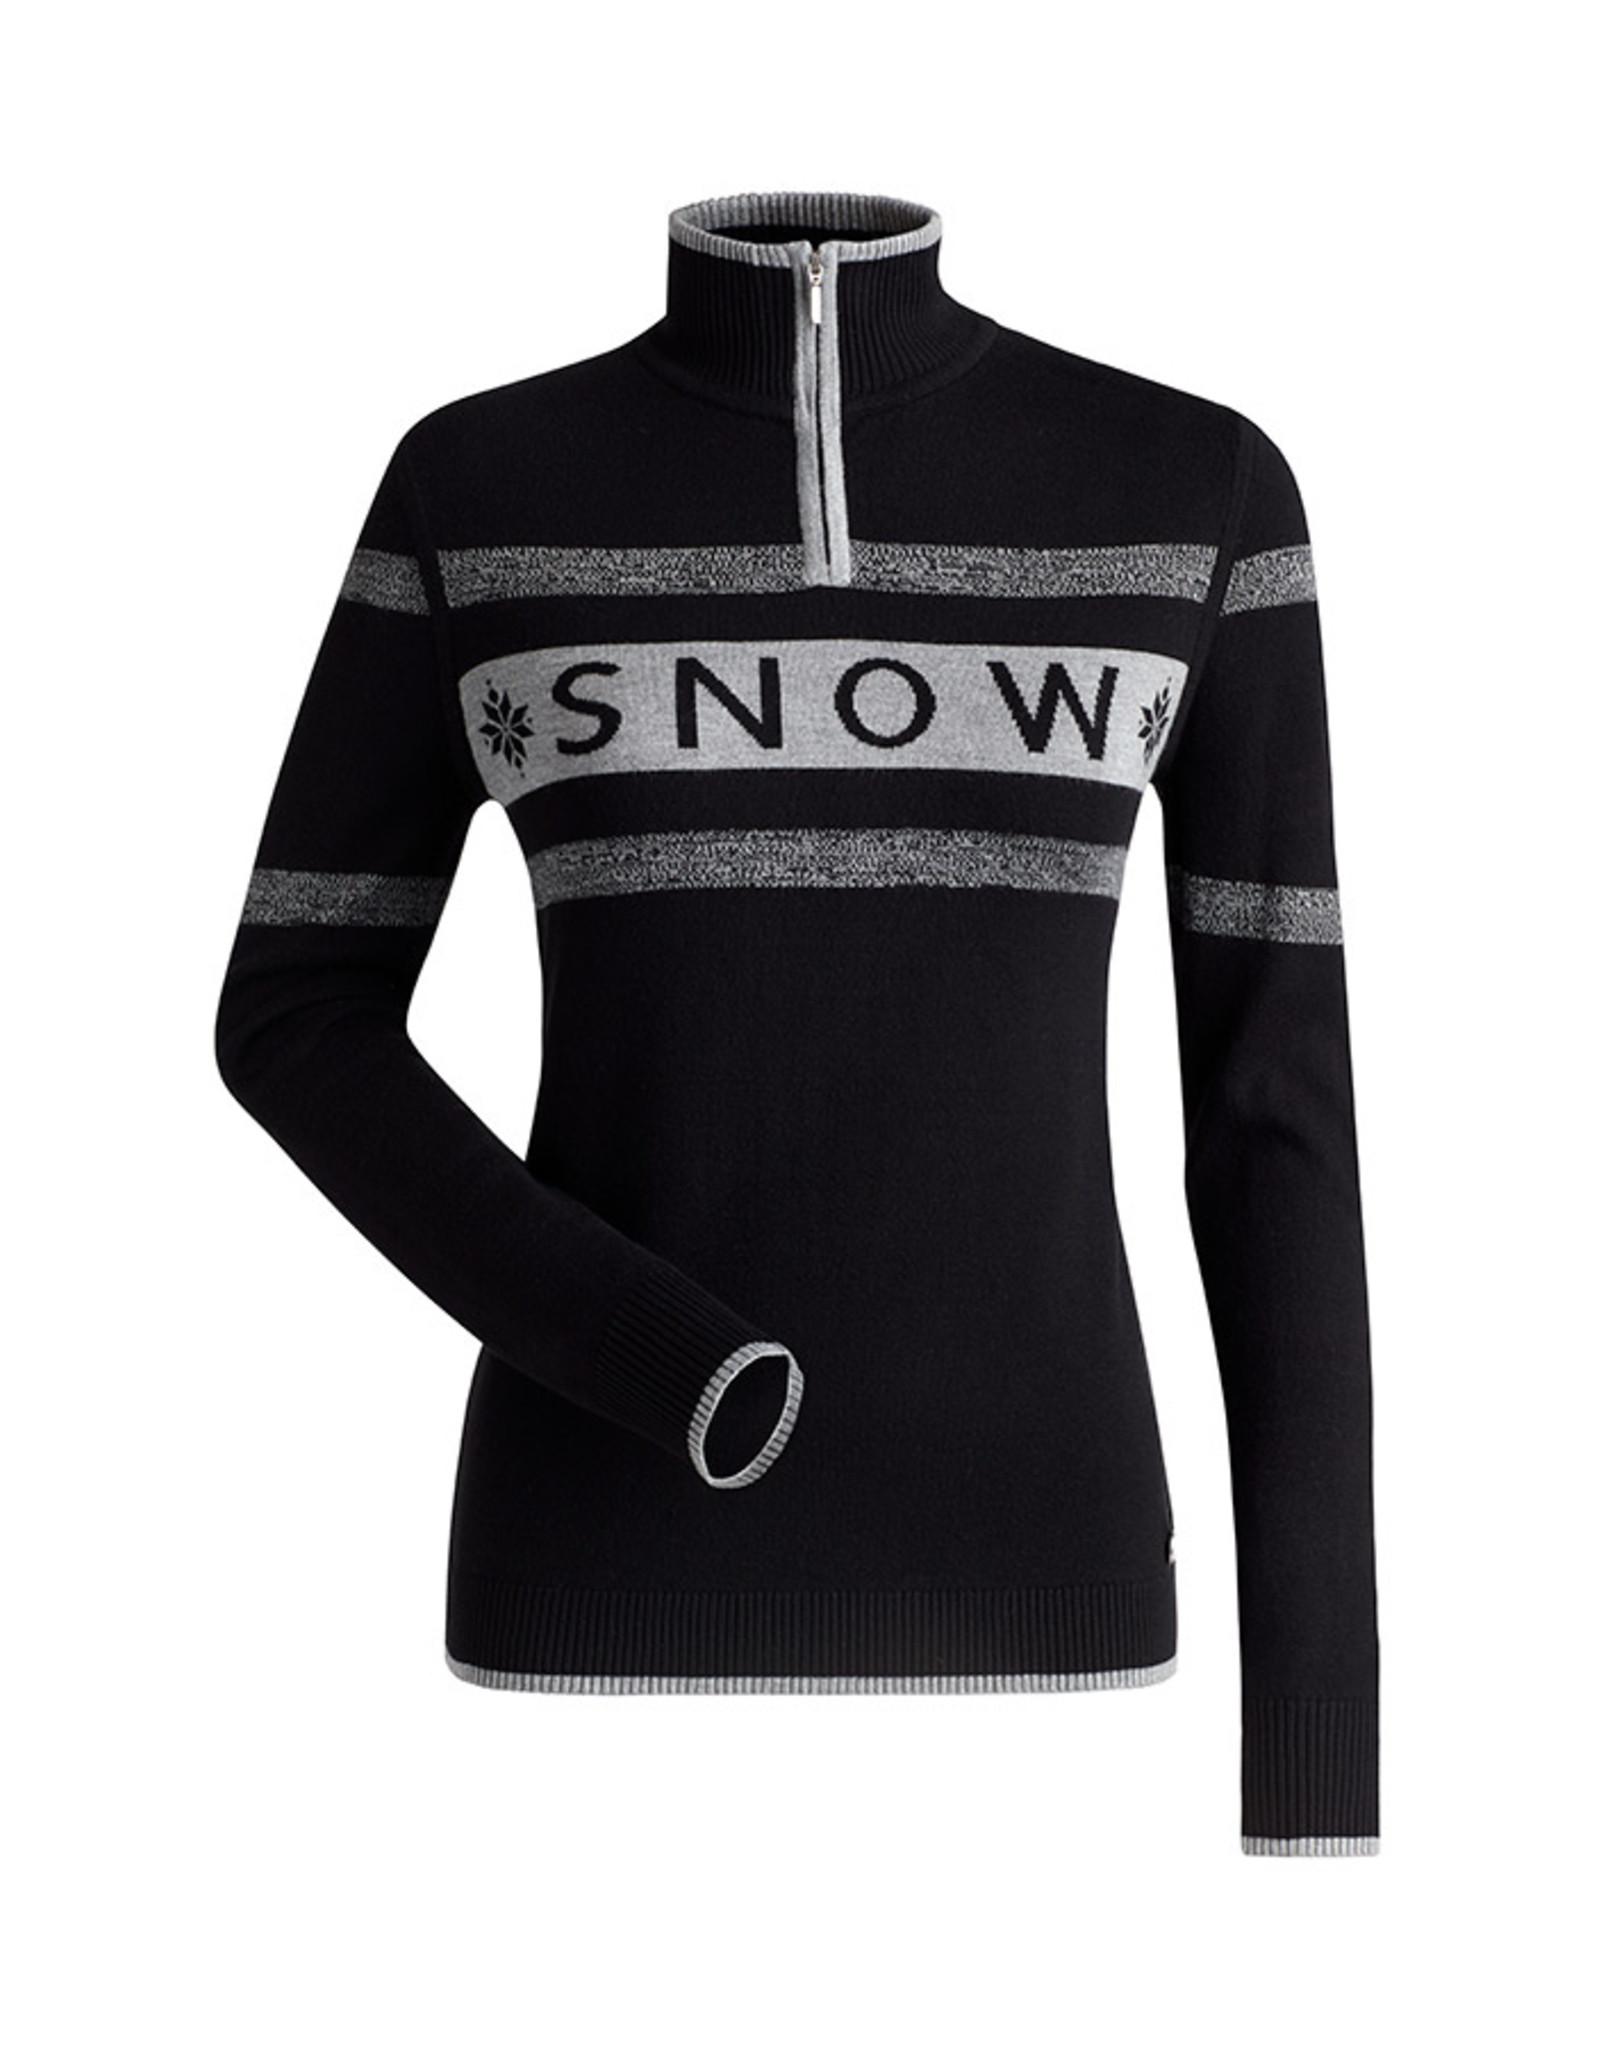 NILS NILS Women's Snow Sweater